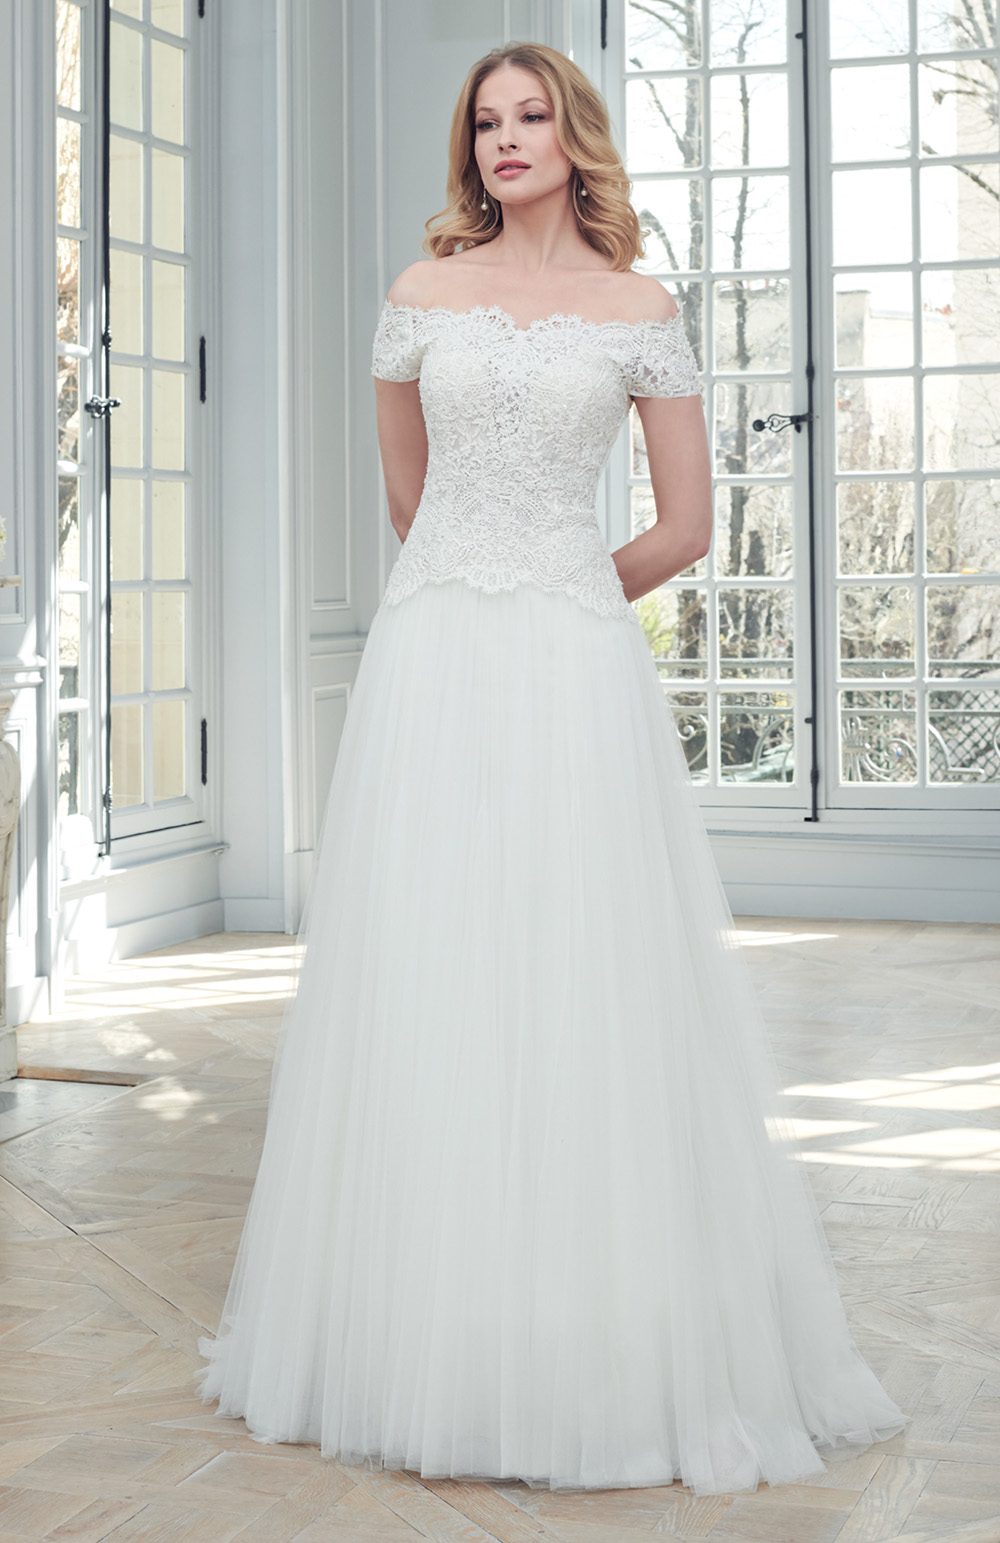 Robe de mariée Modèle Akila